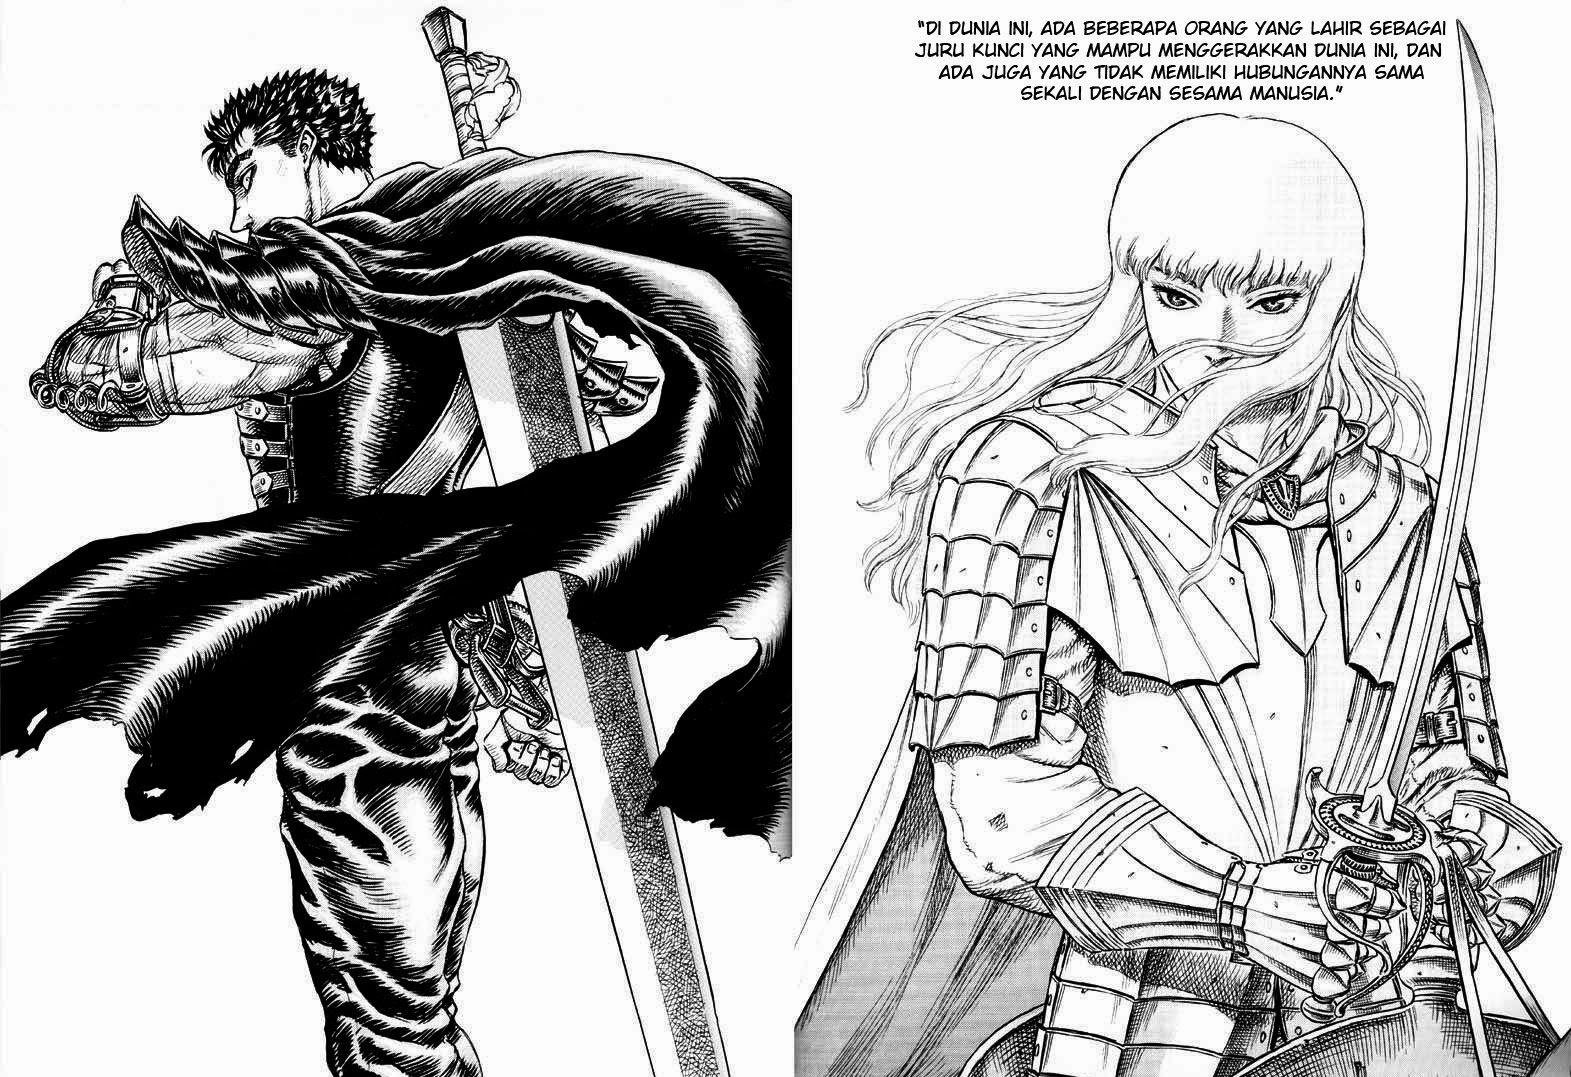 Komik berserk 096 - badai kematian 1 97 Indonesia berserk 096 - badai kematian 1 Terbaru 1 Baca Manga Komik Indonesia